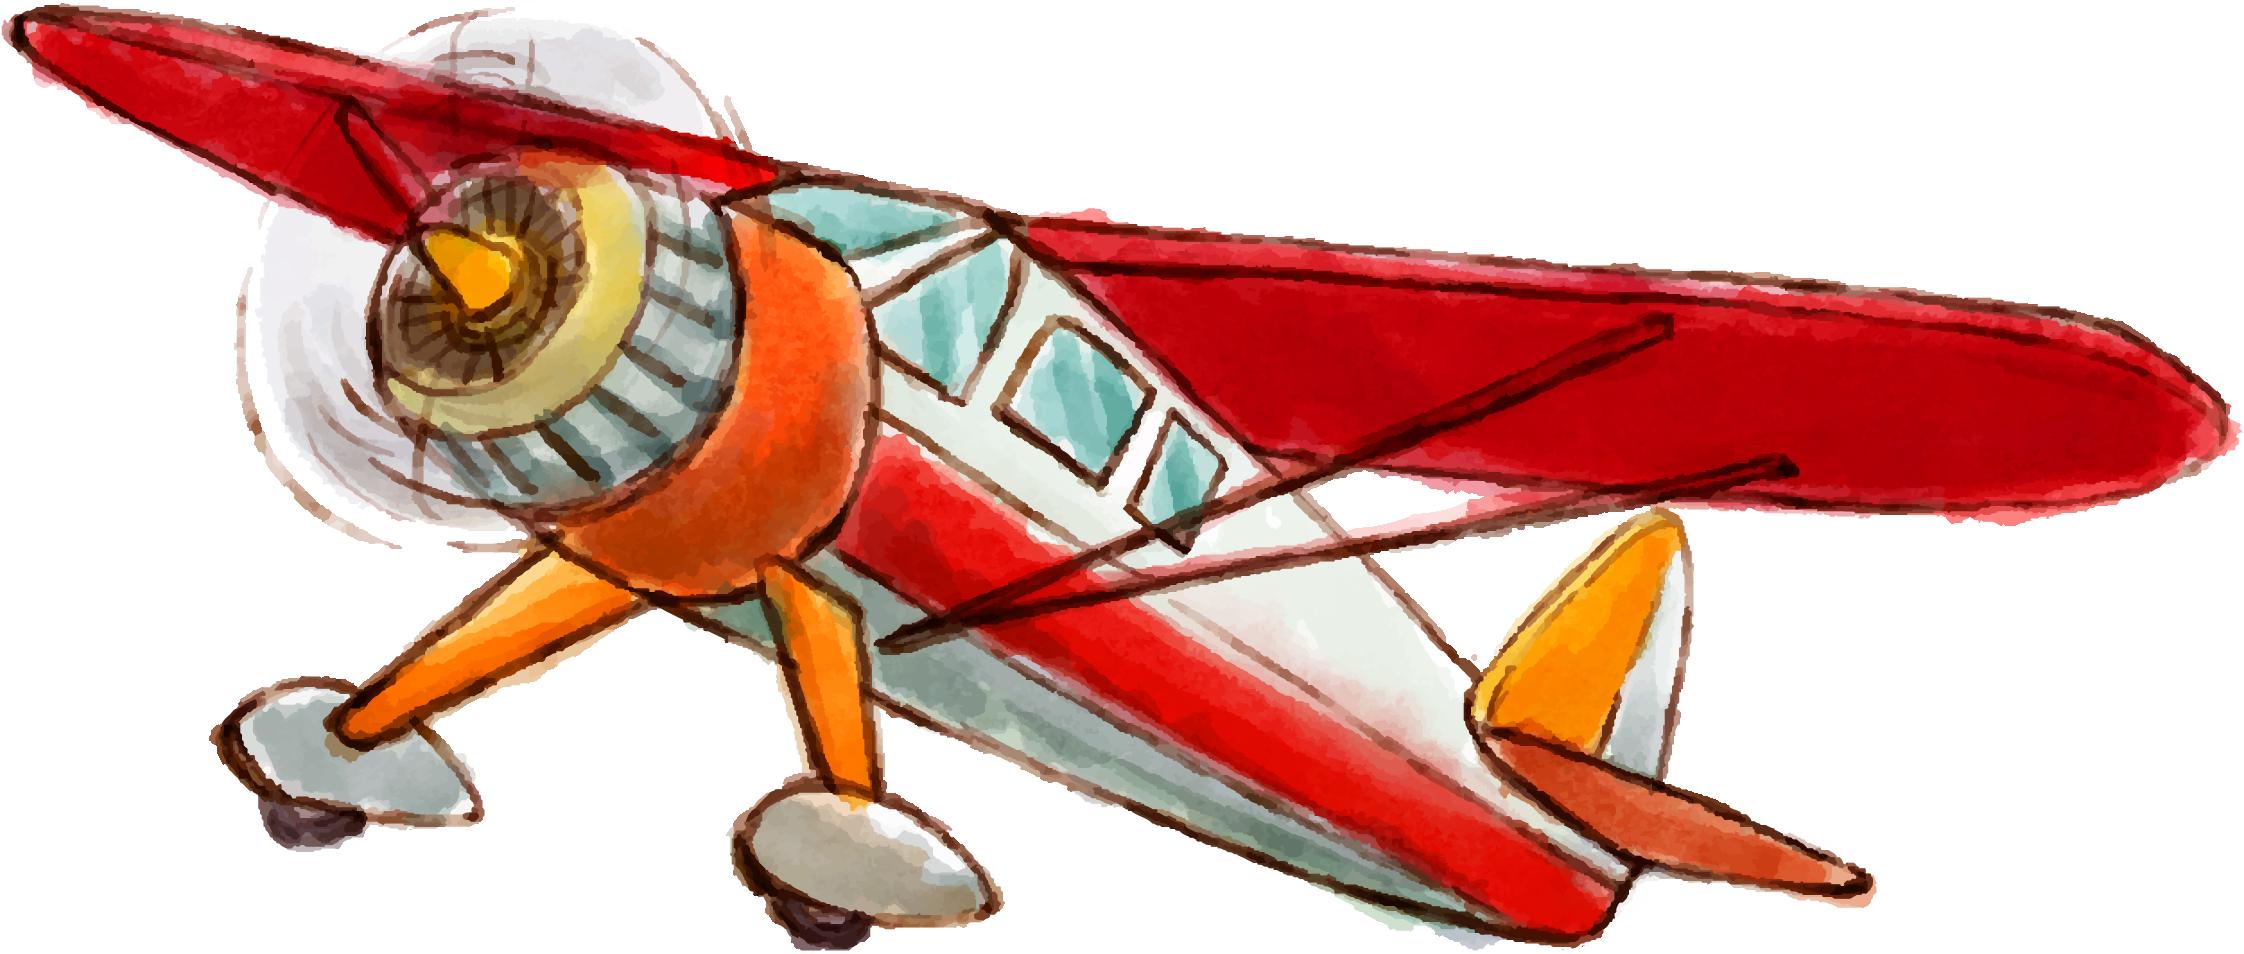 Airplane Light aircraft Euclidean vector.